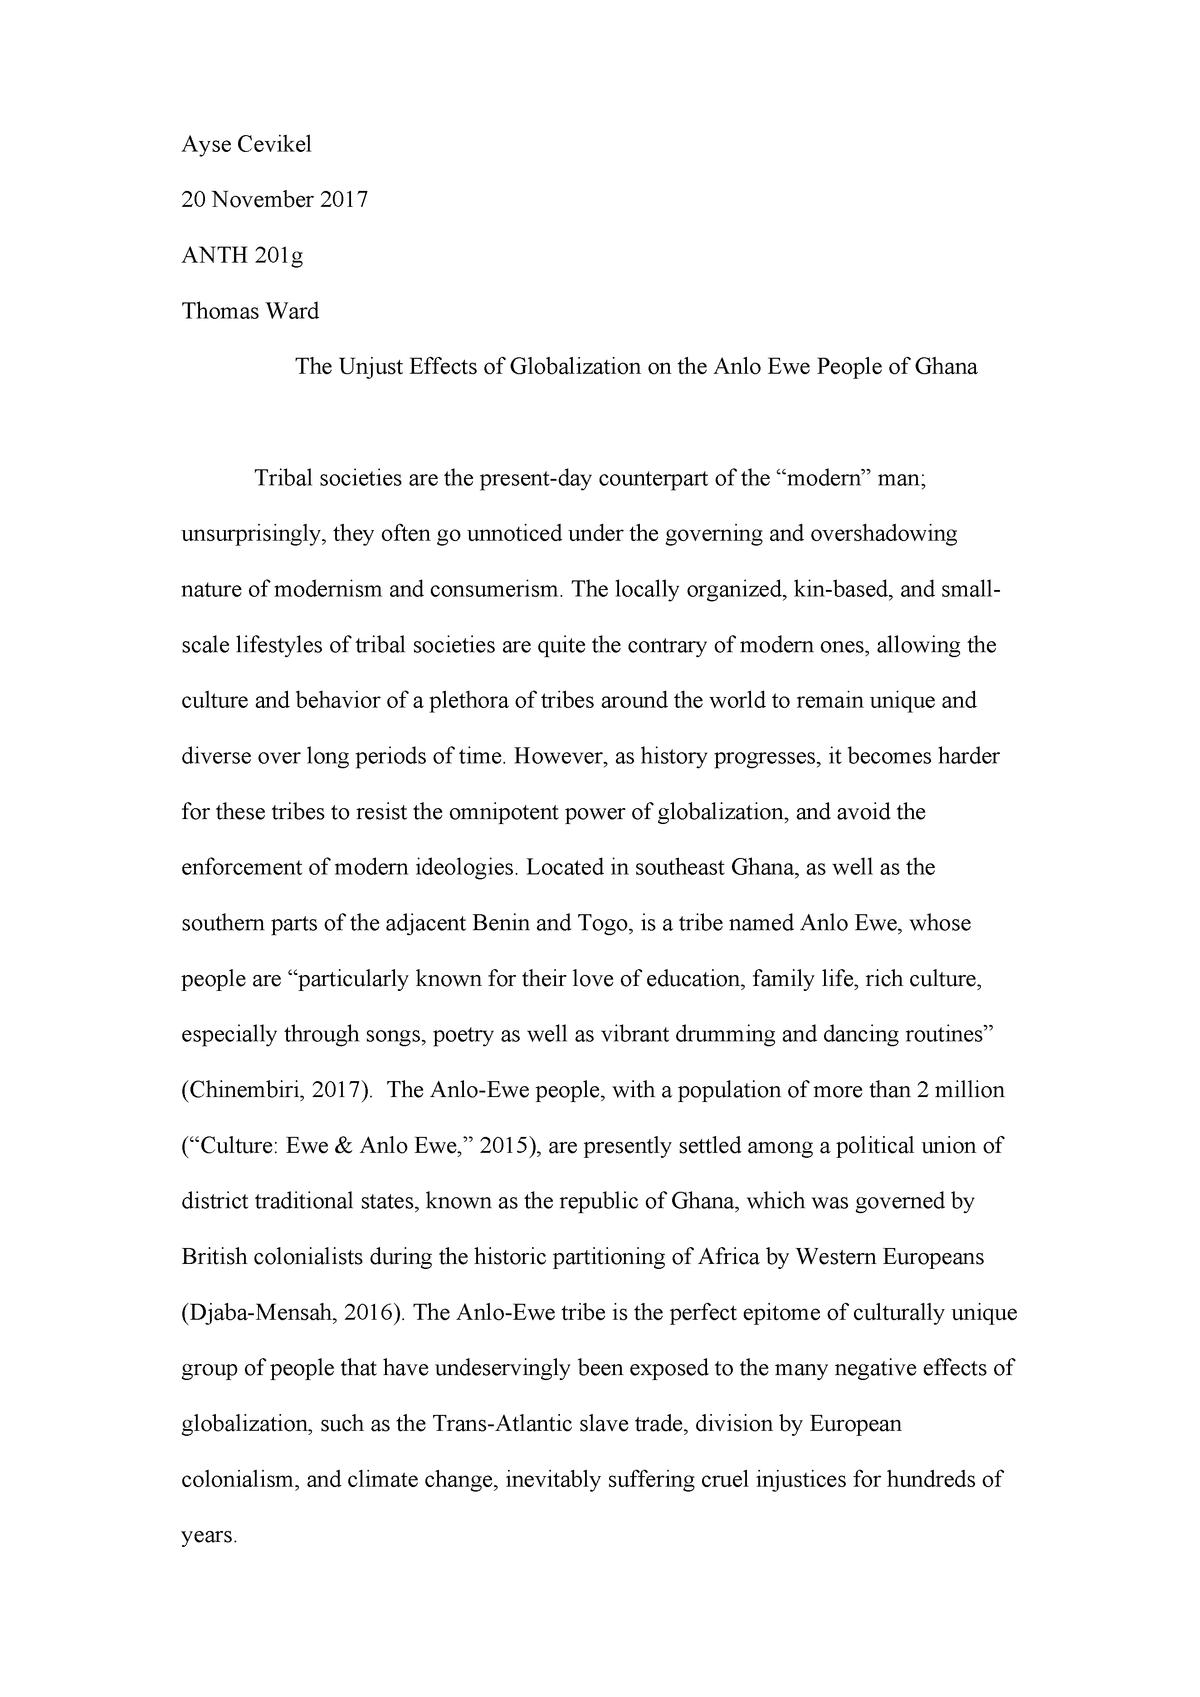 ANTH 201 Final Paper - ANTH201g - USC - StuDocu